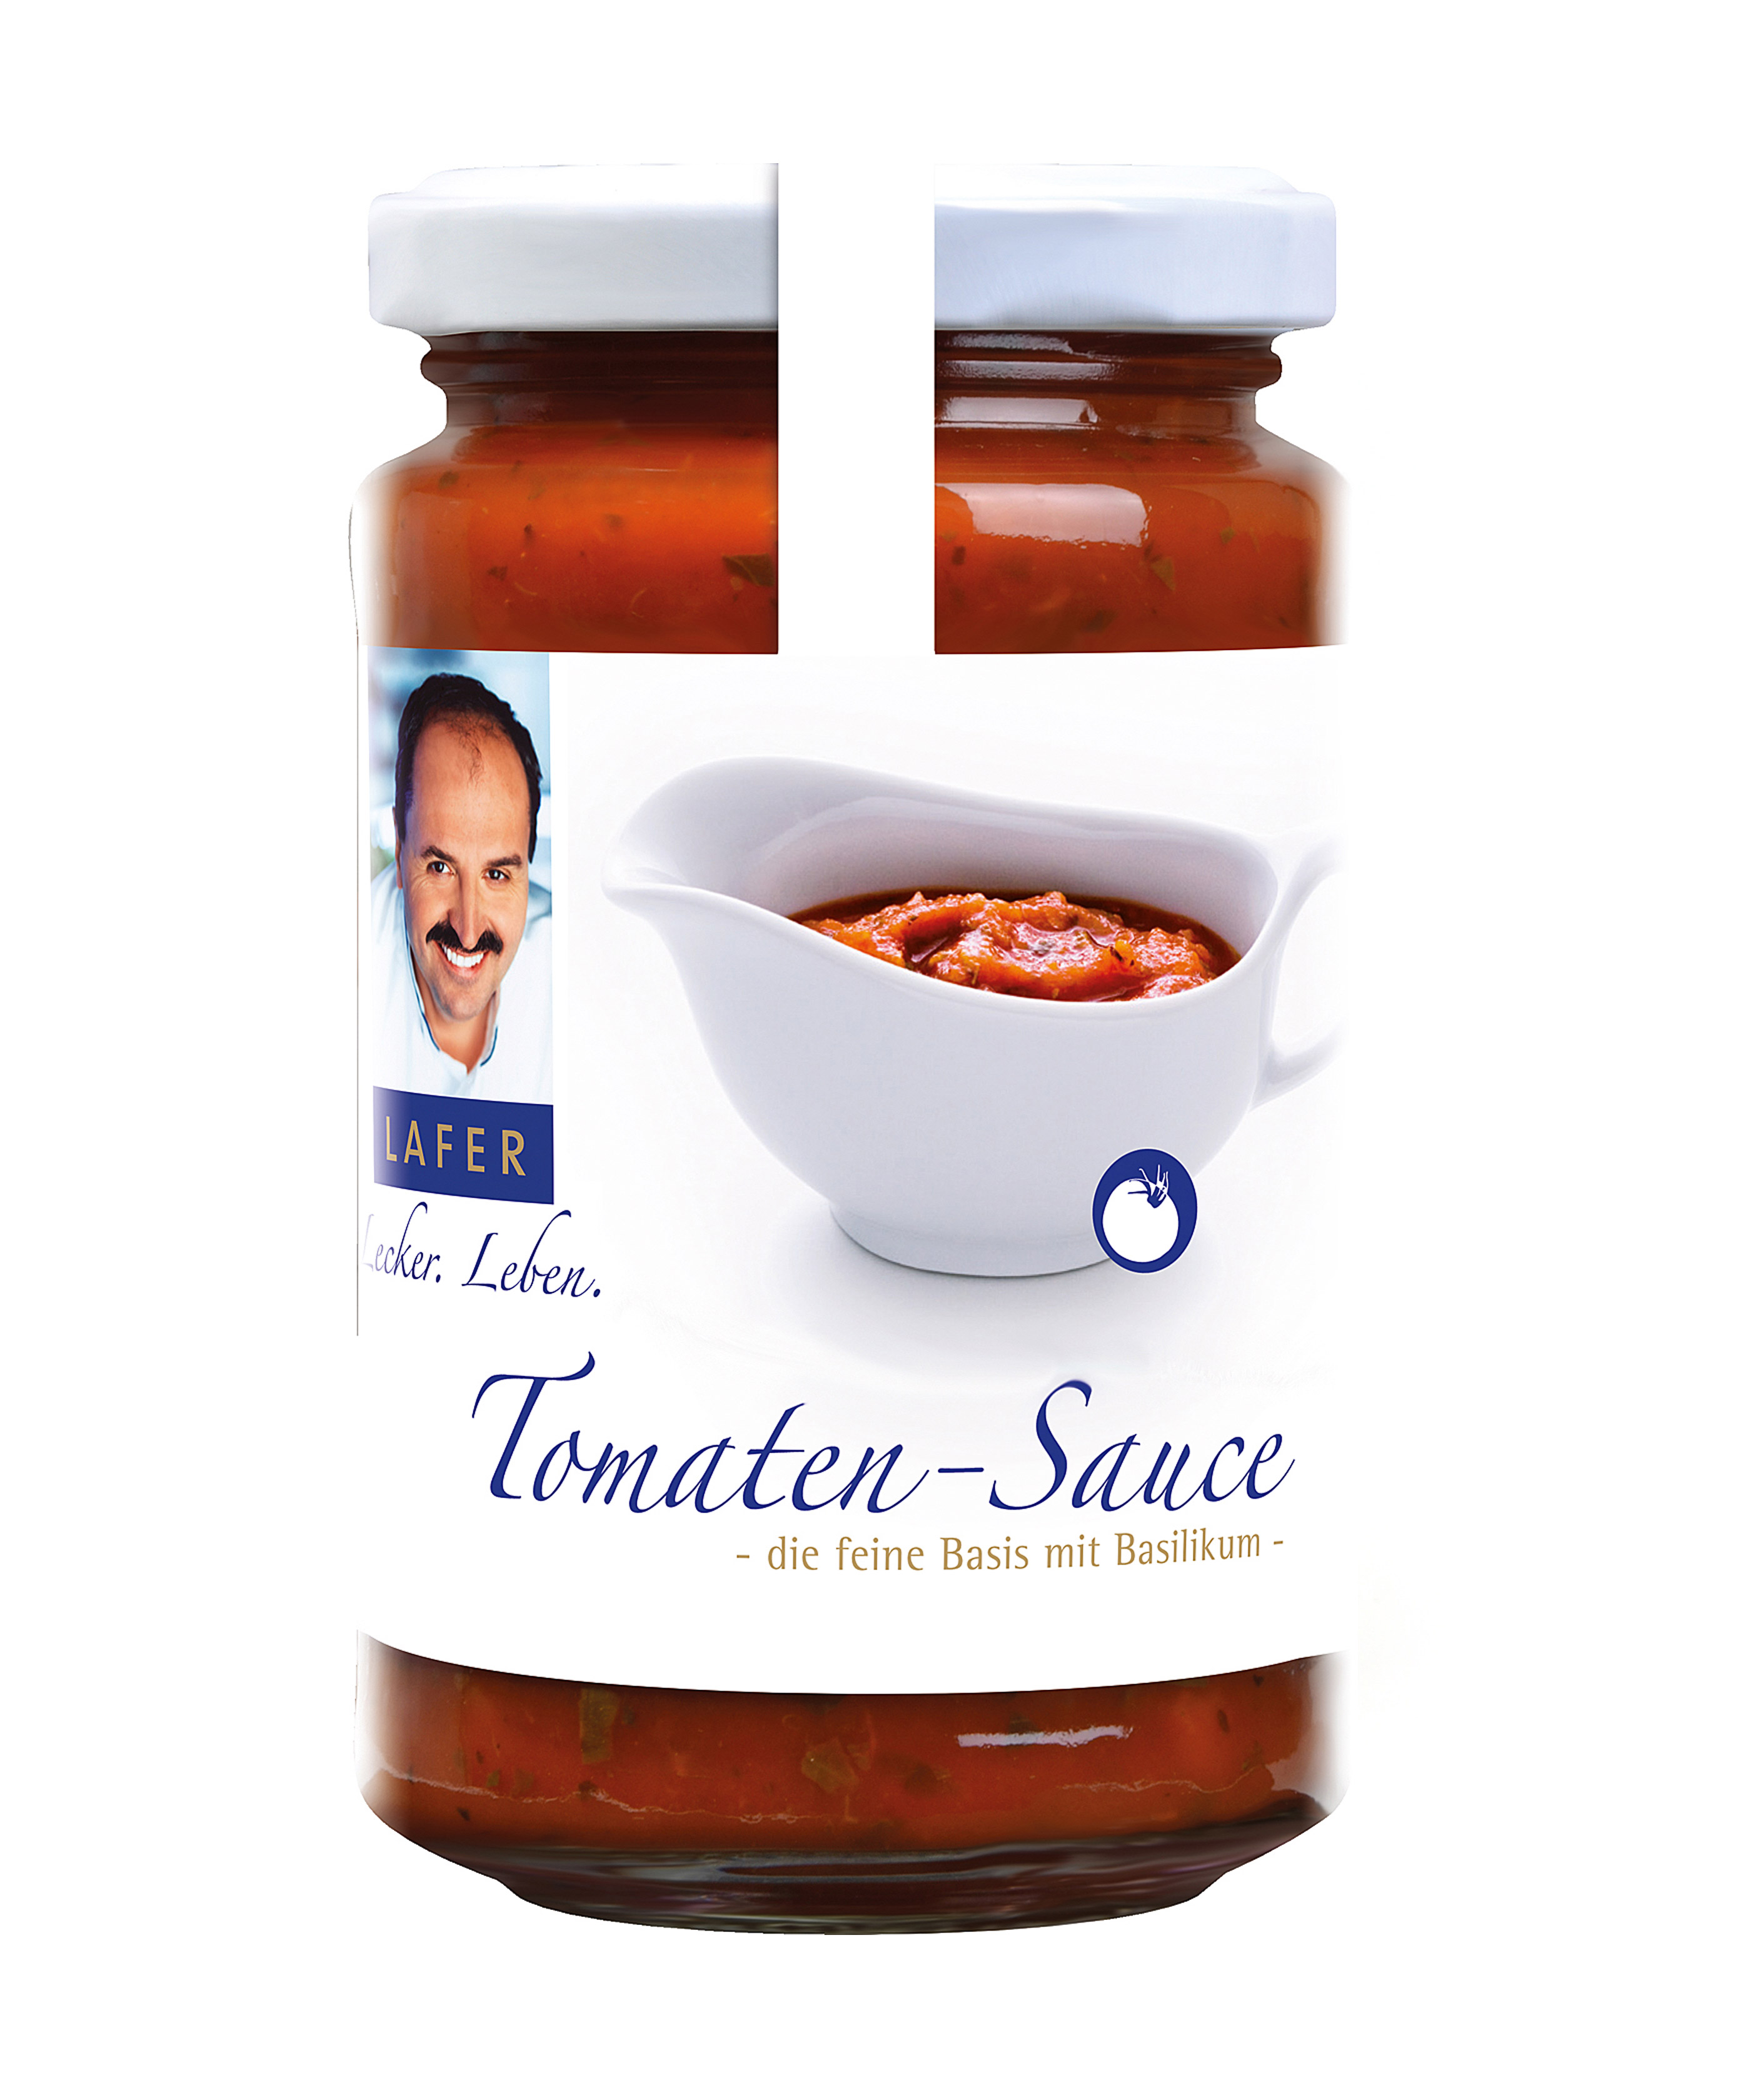 johann-lafer-tomaten-sauce-mit-basilikum-200-ml, 3.49 EUR @ gourvita-com